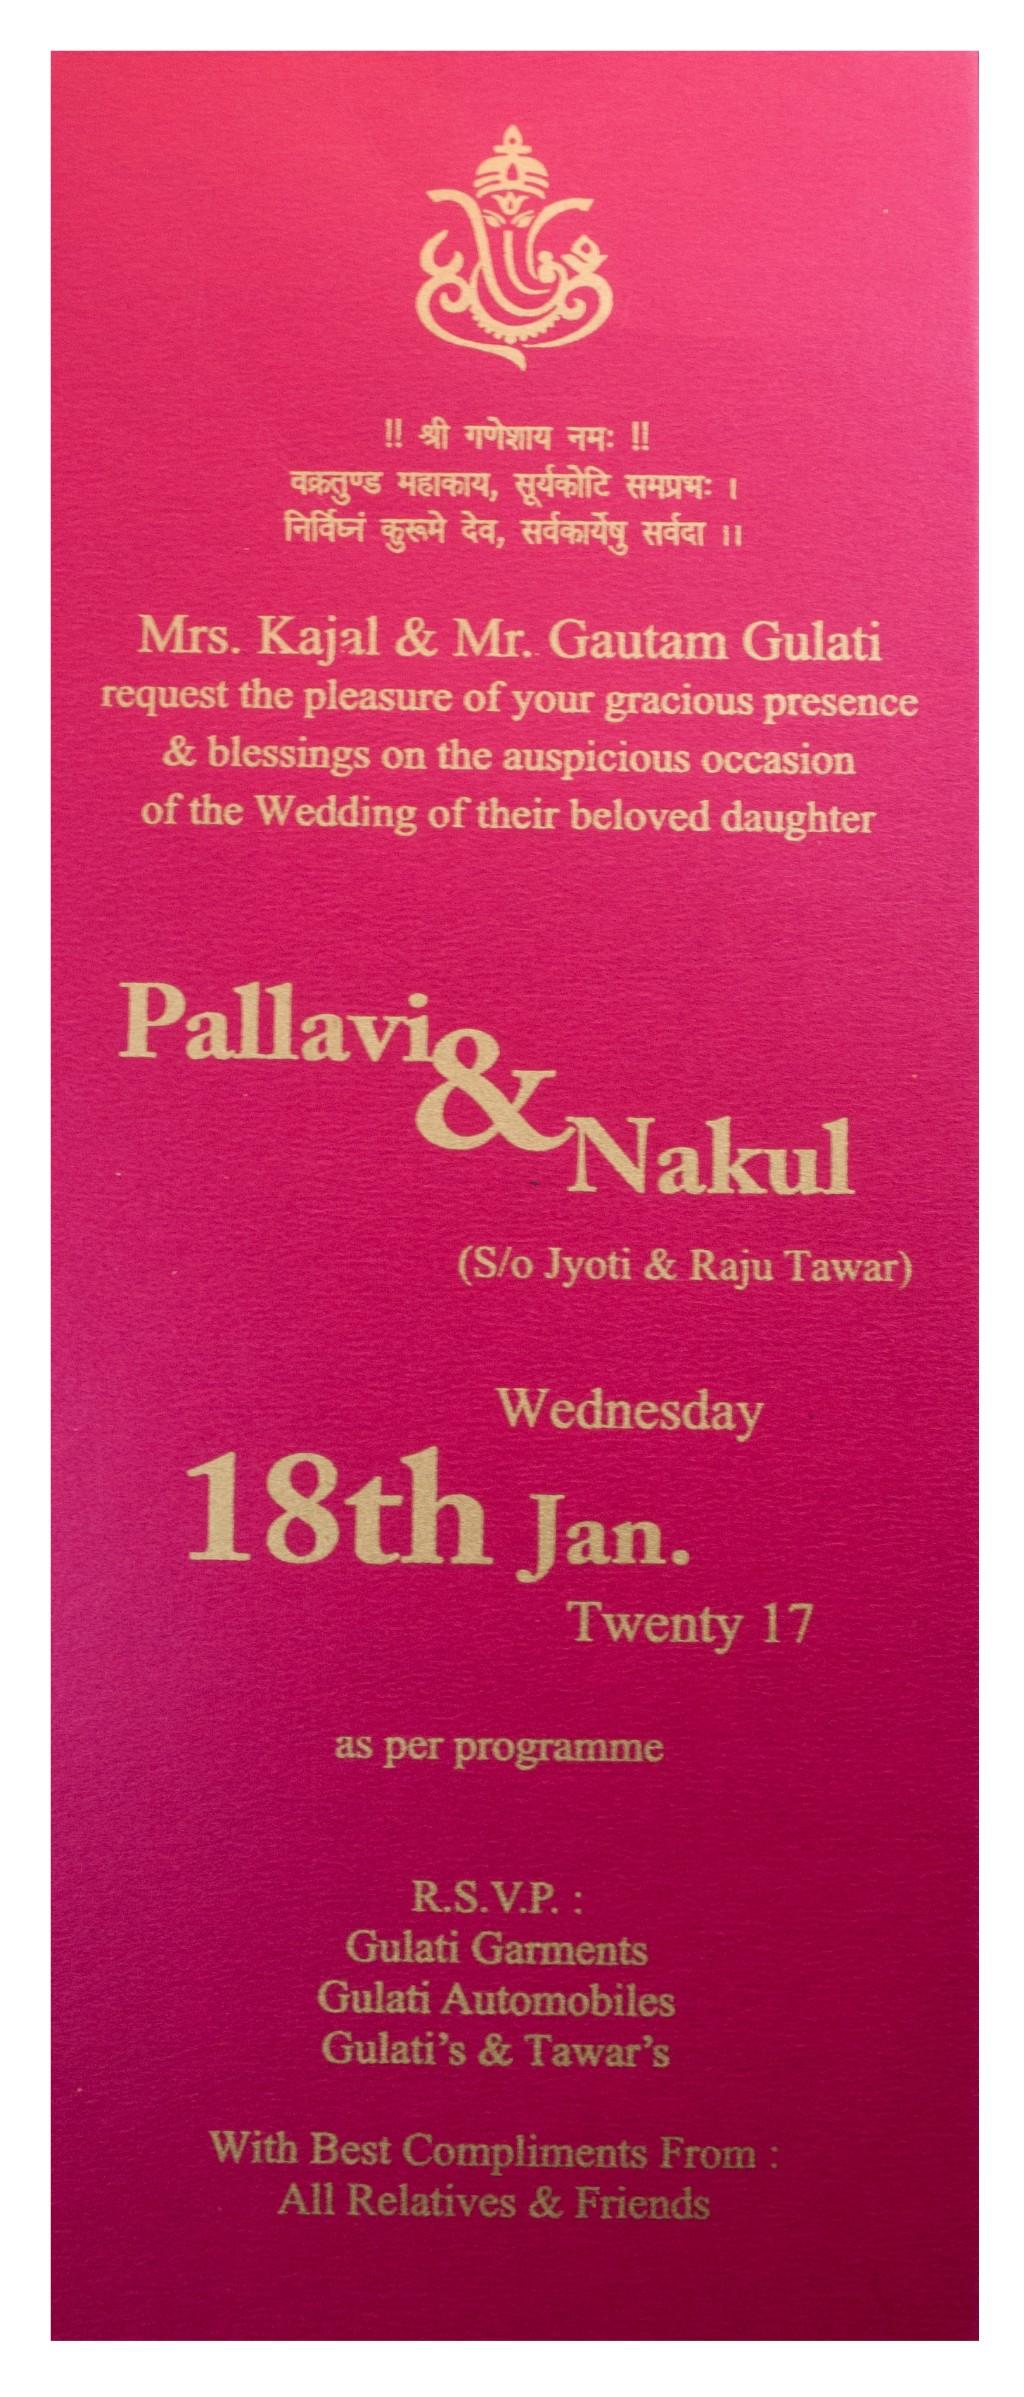 Old Fashioned Wedding Invites With Inserts Ornament - Invitation ...